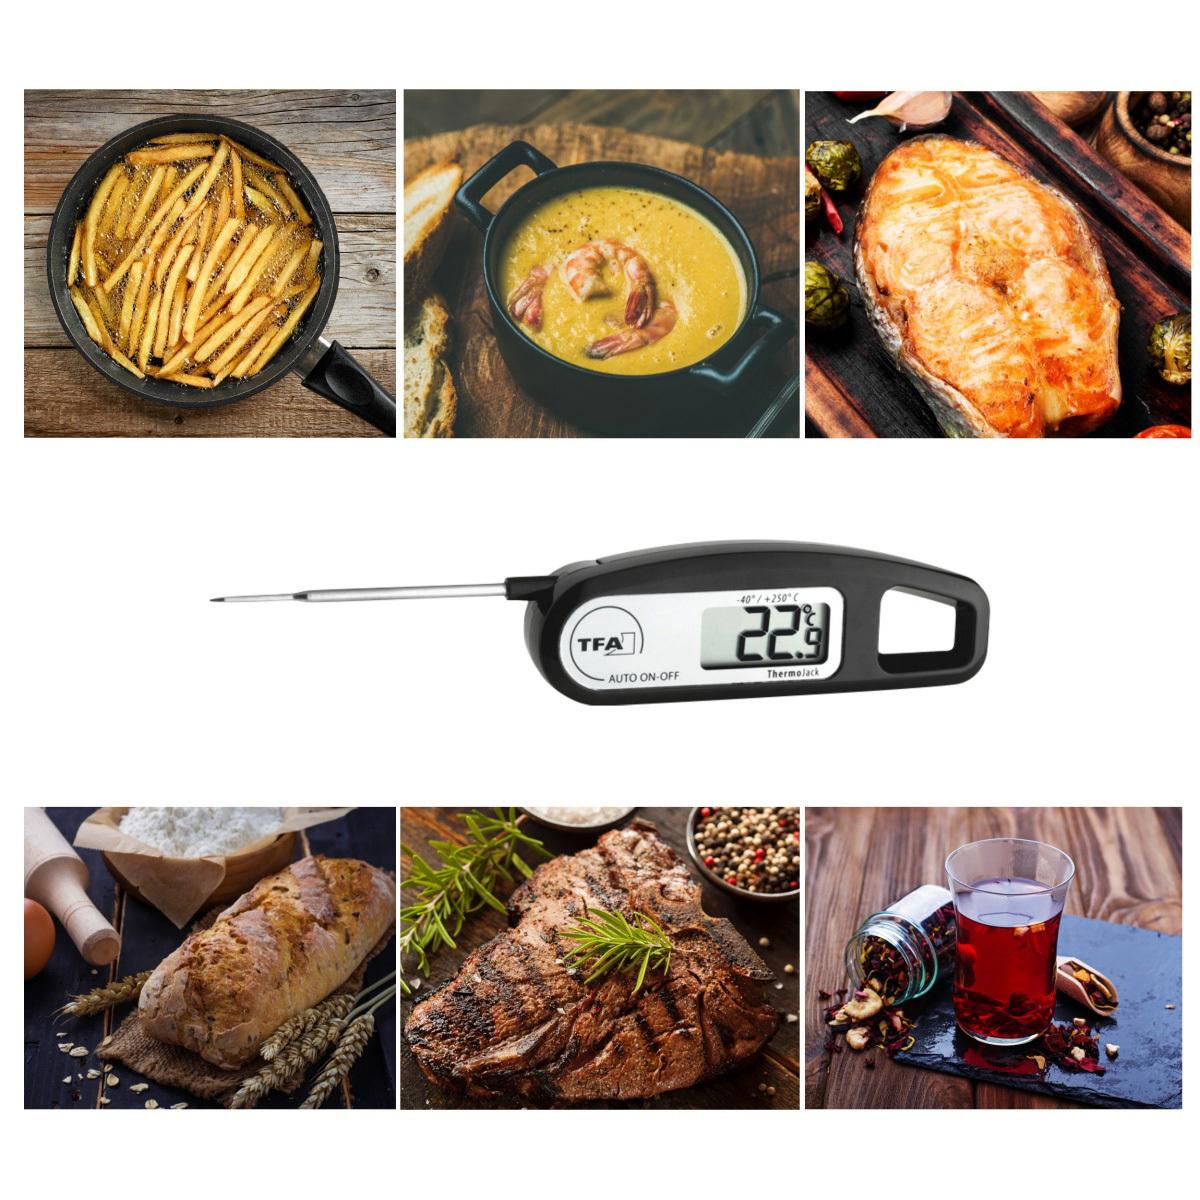 30-1047-01-digitales-einstich-thermometer-thermo-jack-anwendung-1200x1200px.jpg